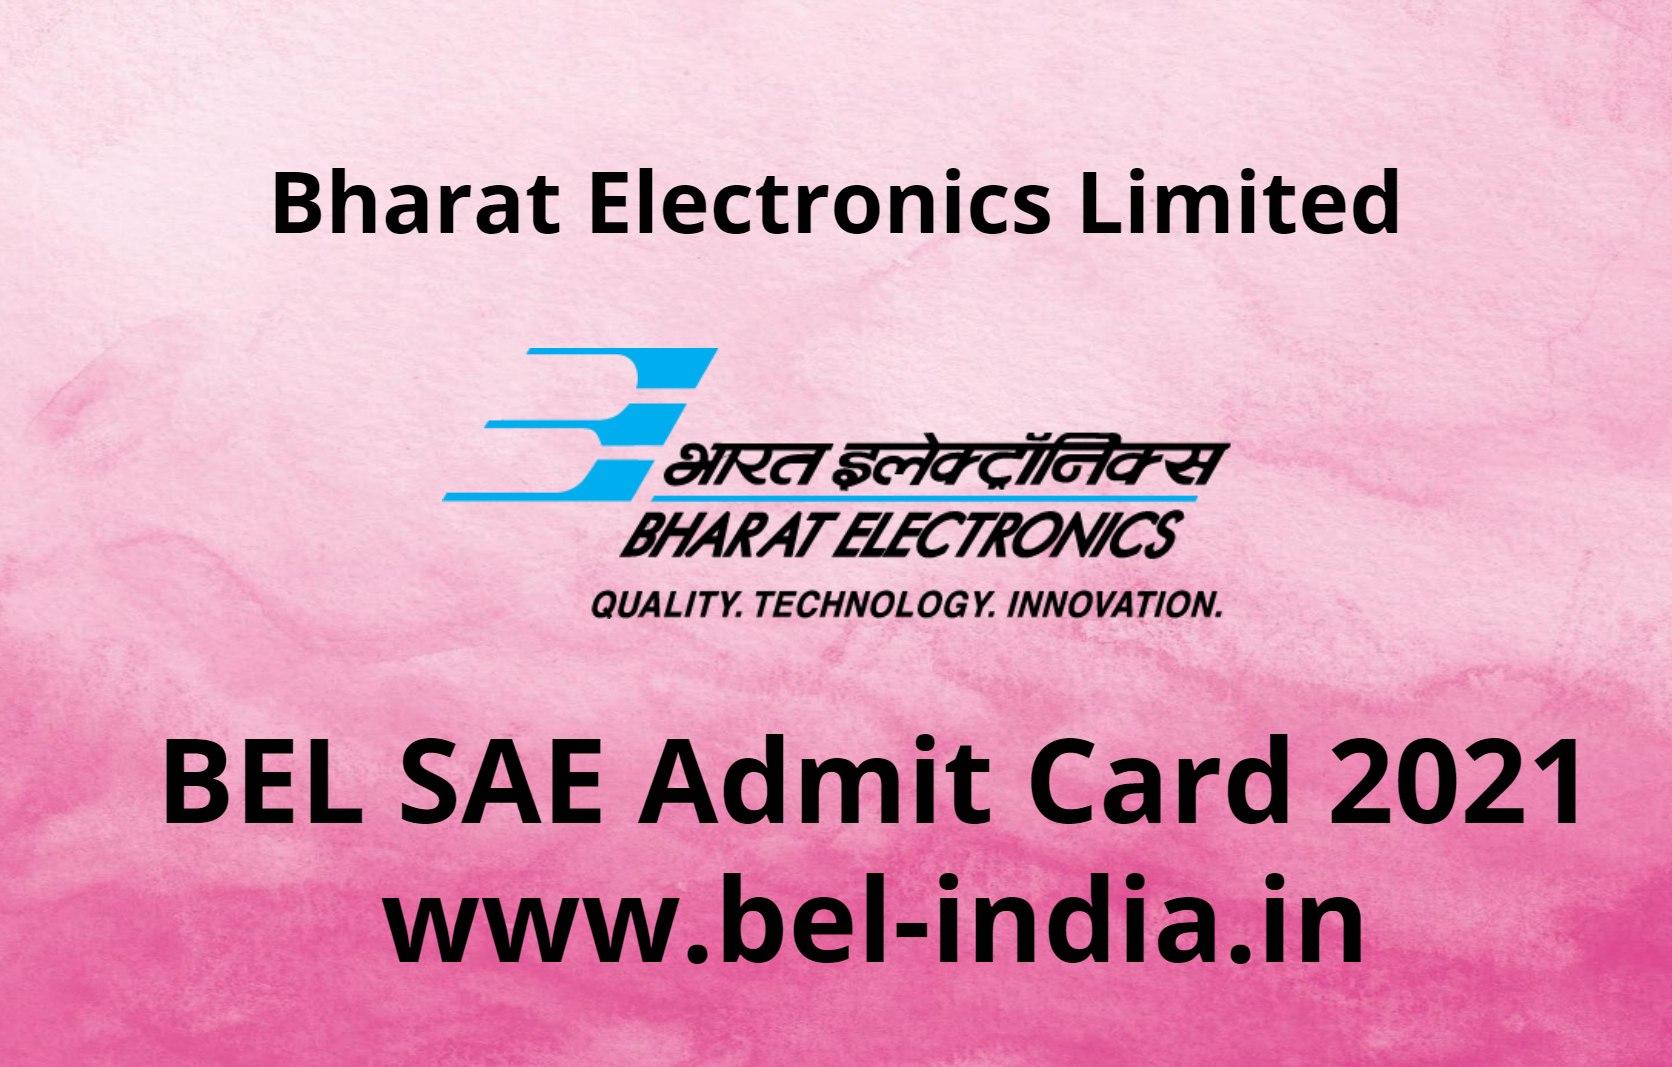 BEL SAE Admit Card 2021 - www.bel-india.in